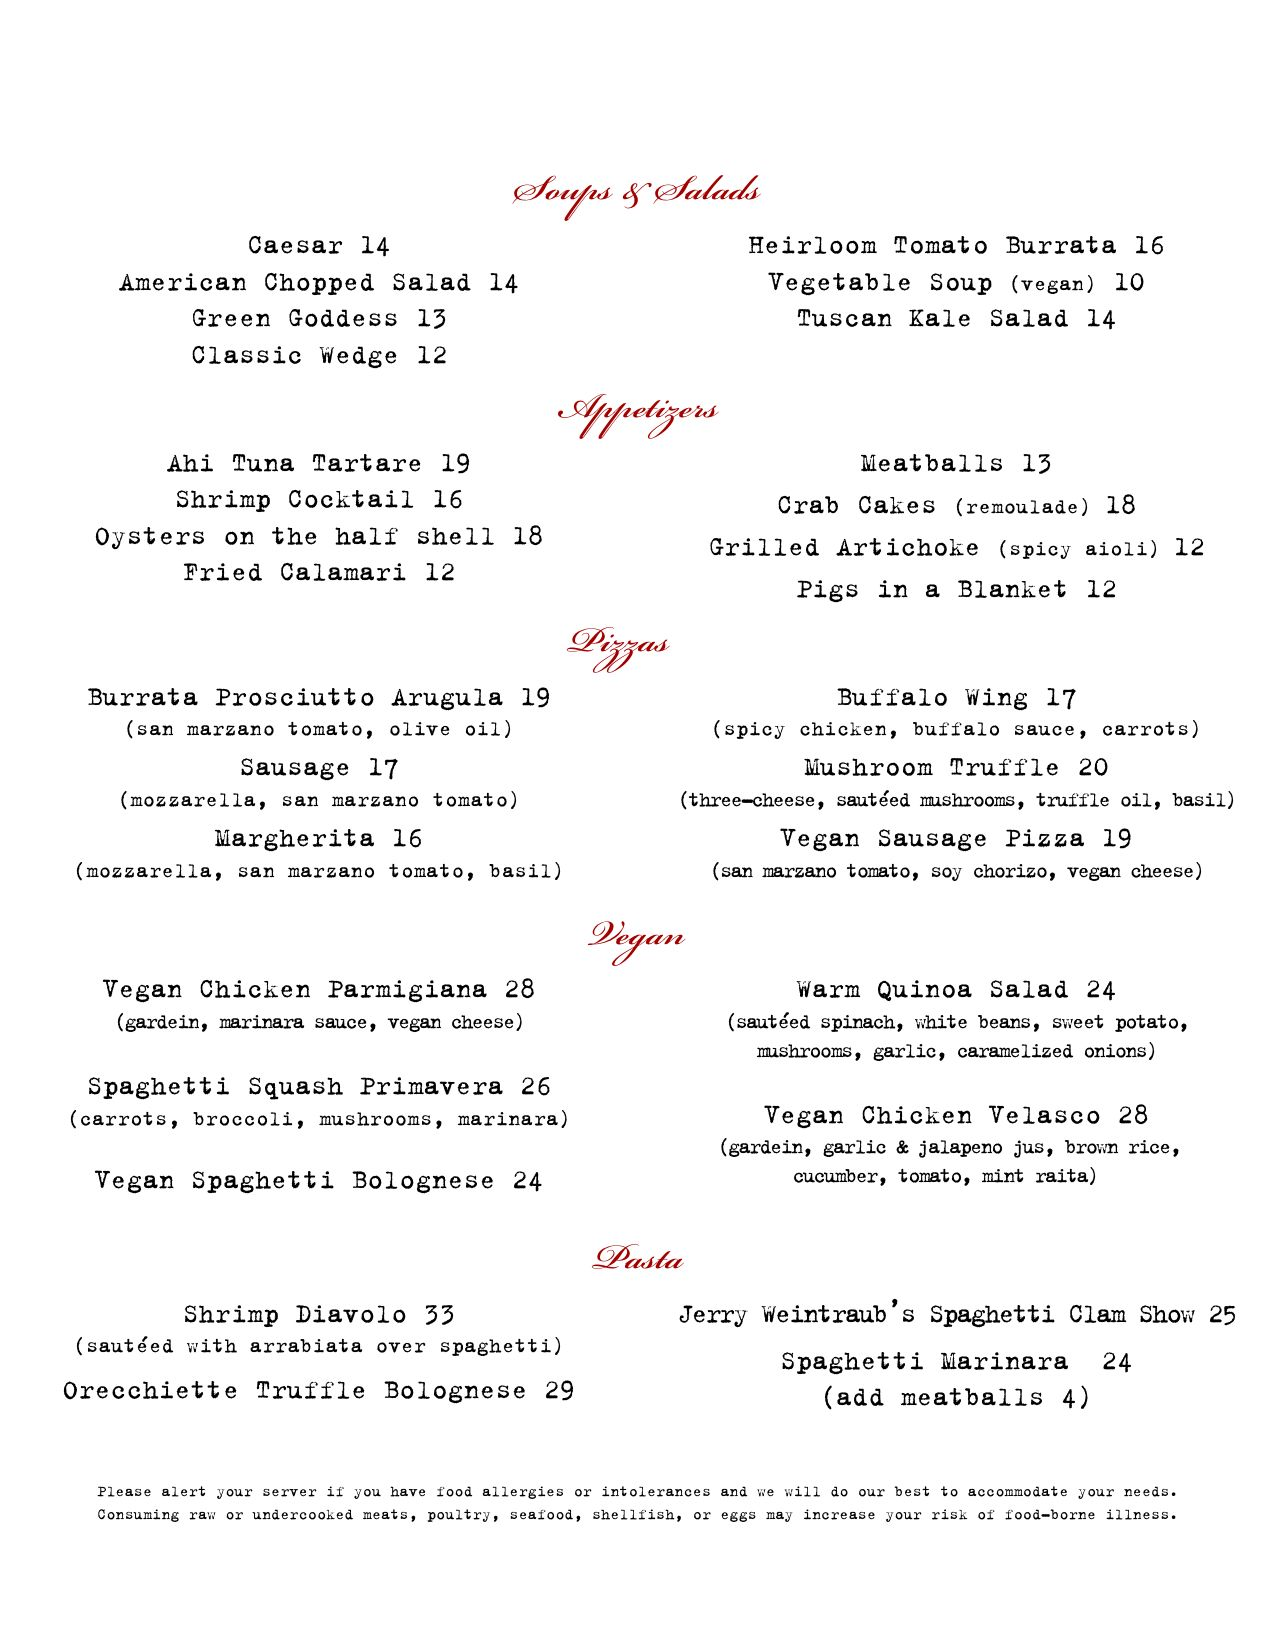 Craig\'s, West Hollywood, CA, dinner menu (page 1) http://craigs.la ...